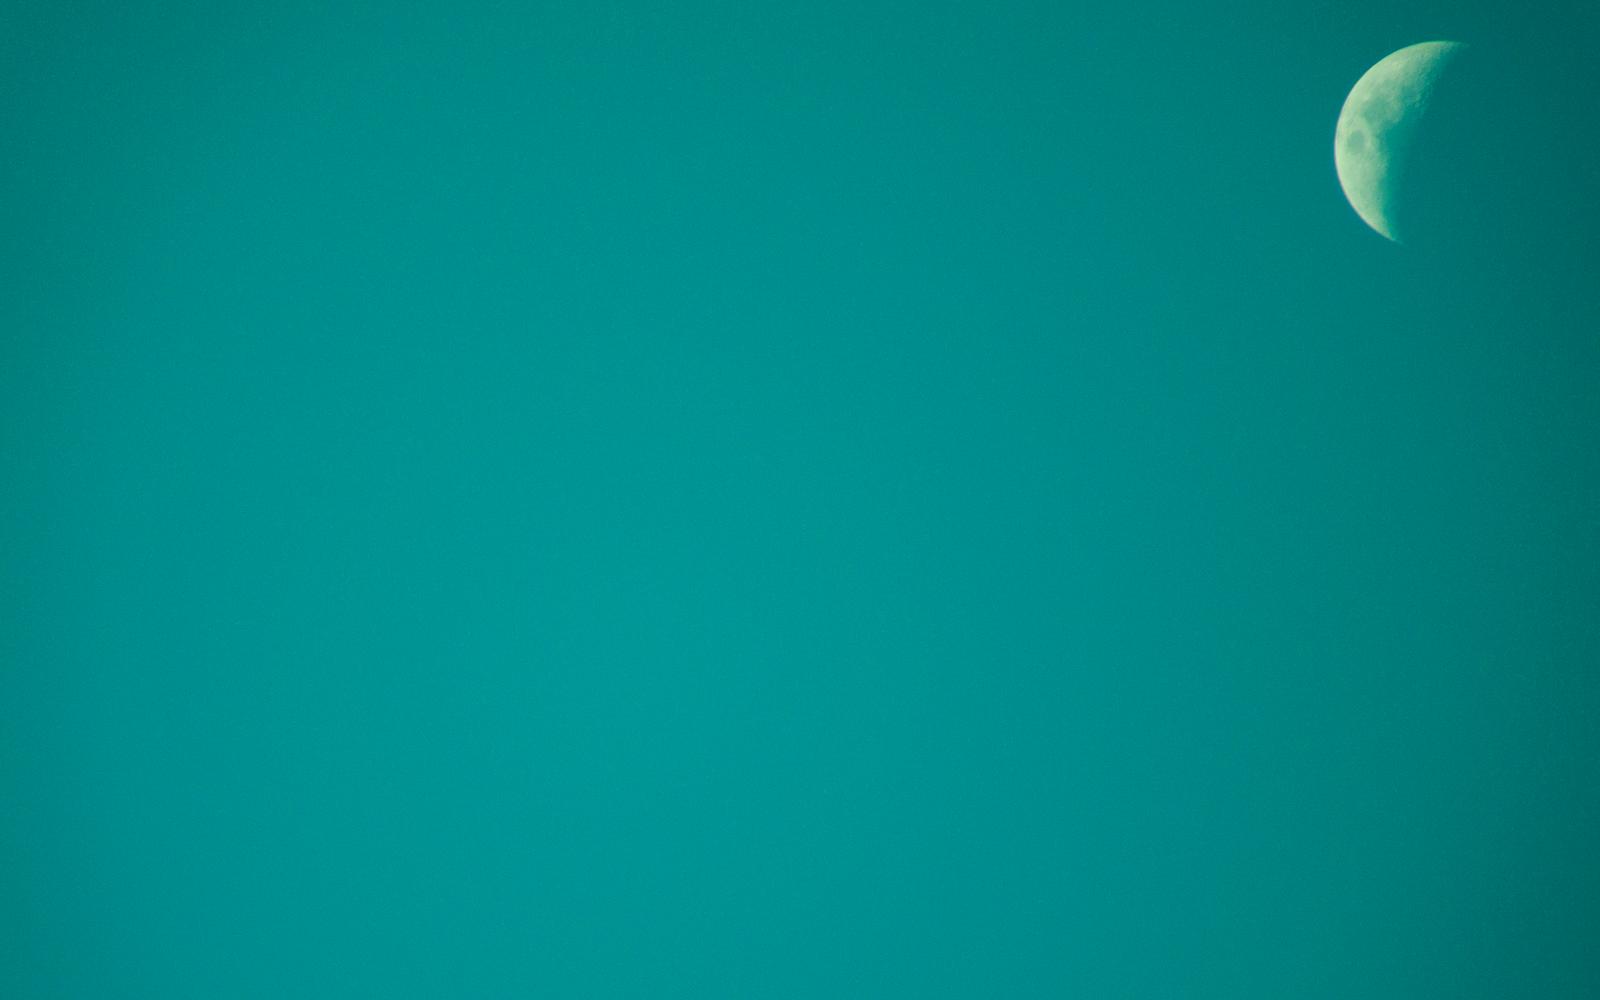 teal green